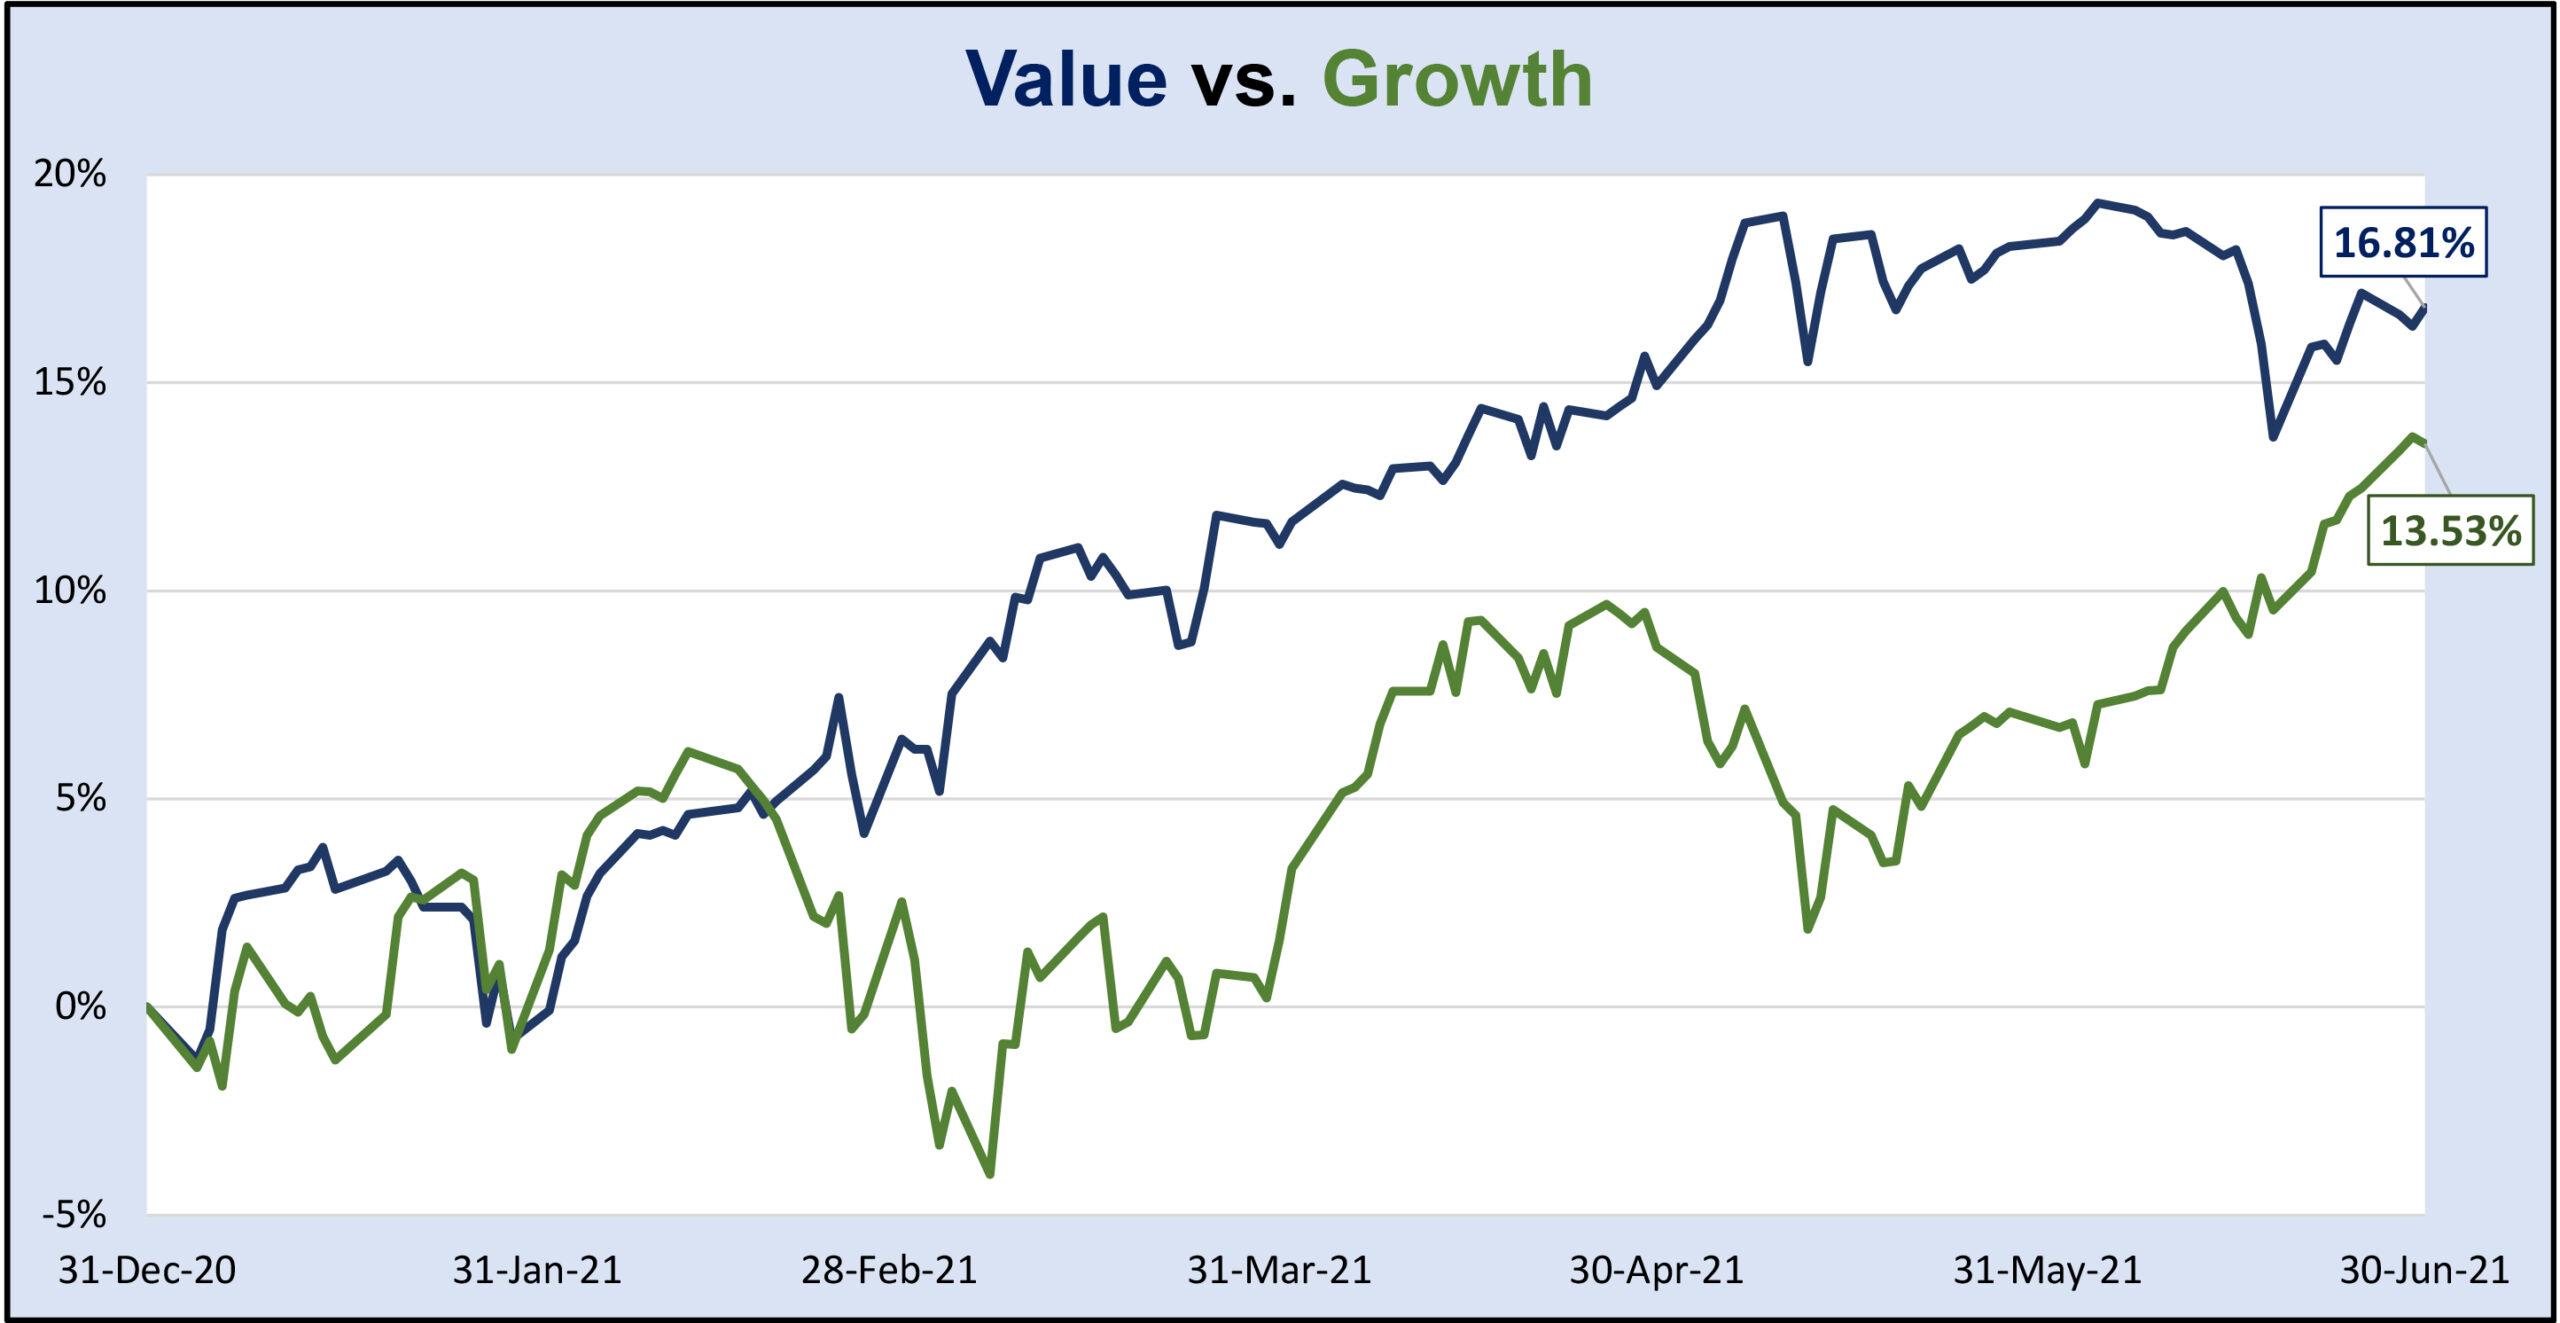 Value vs. Growth